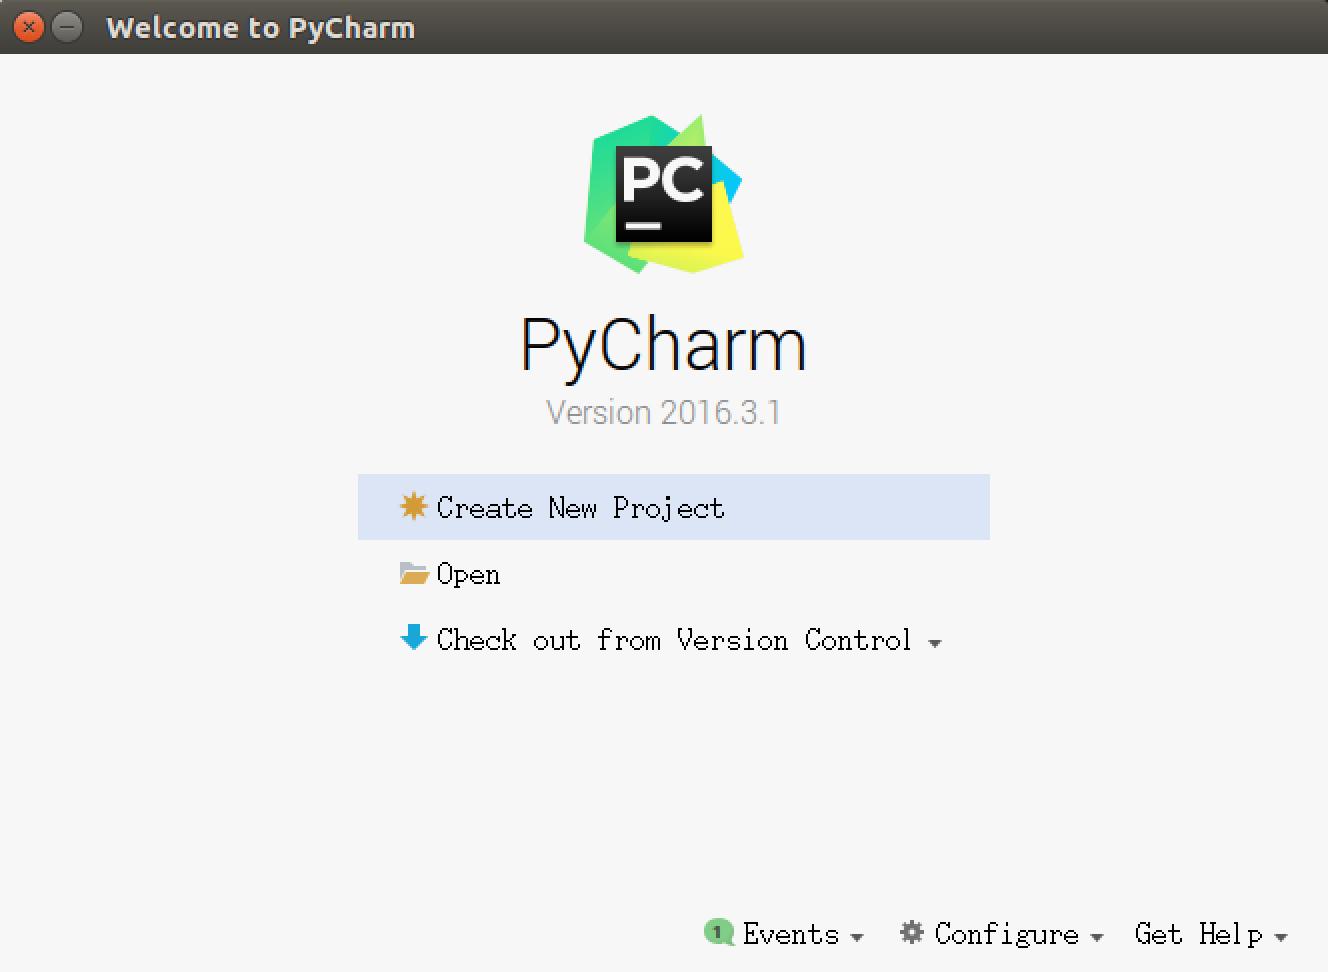 004_PyCharm欢迎页面.png